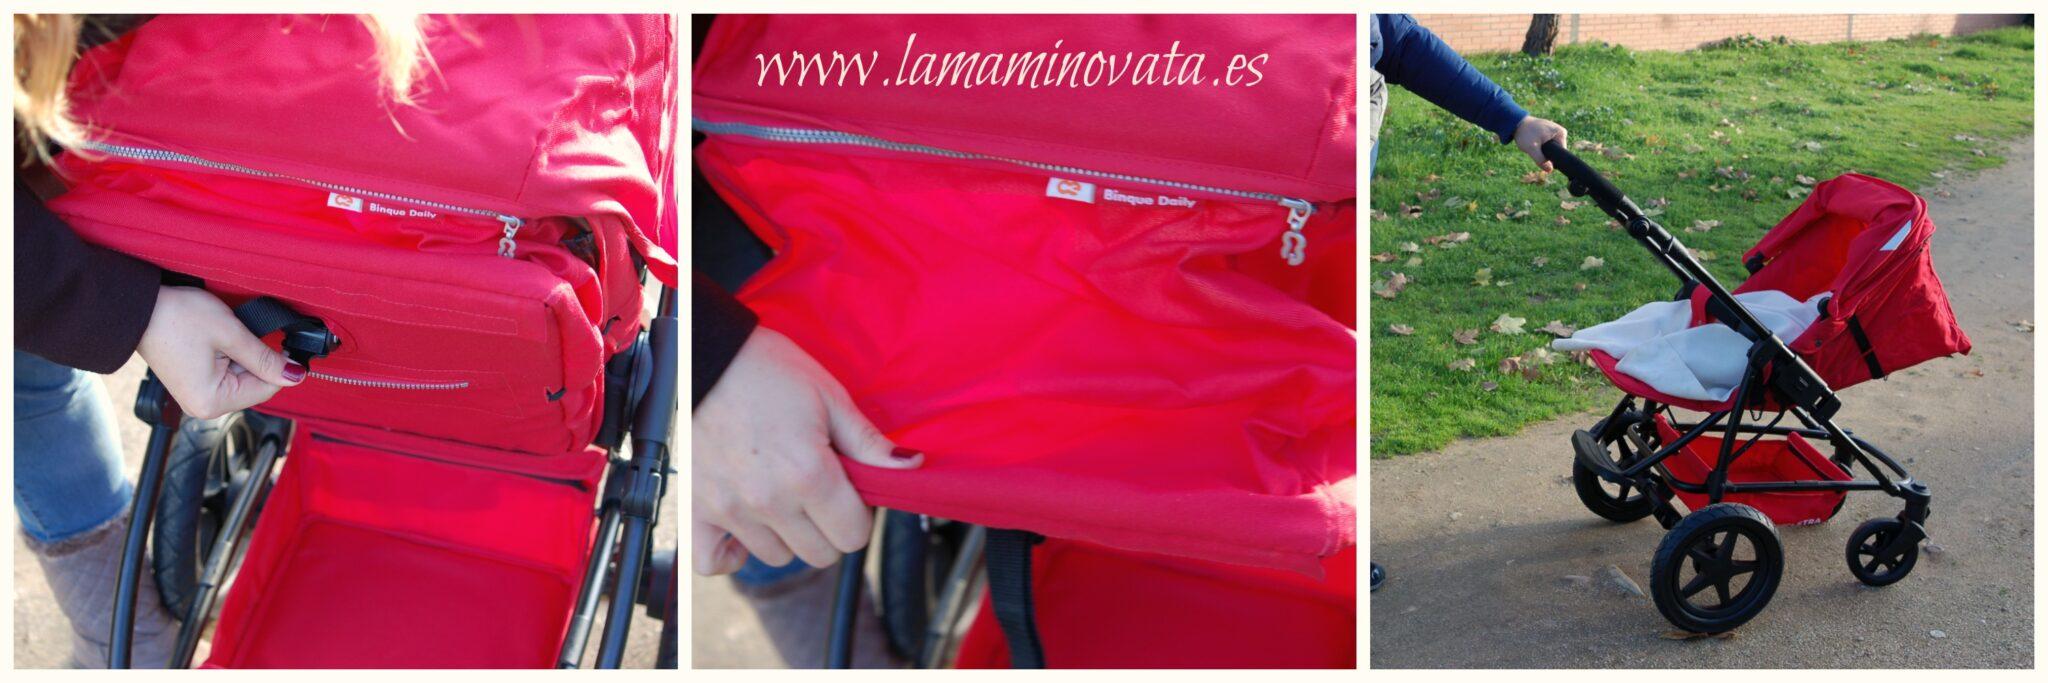 Probamos la silla de paseo Koelstra Binque Daily